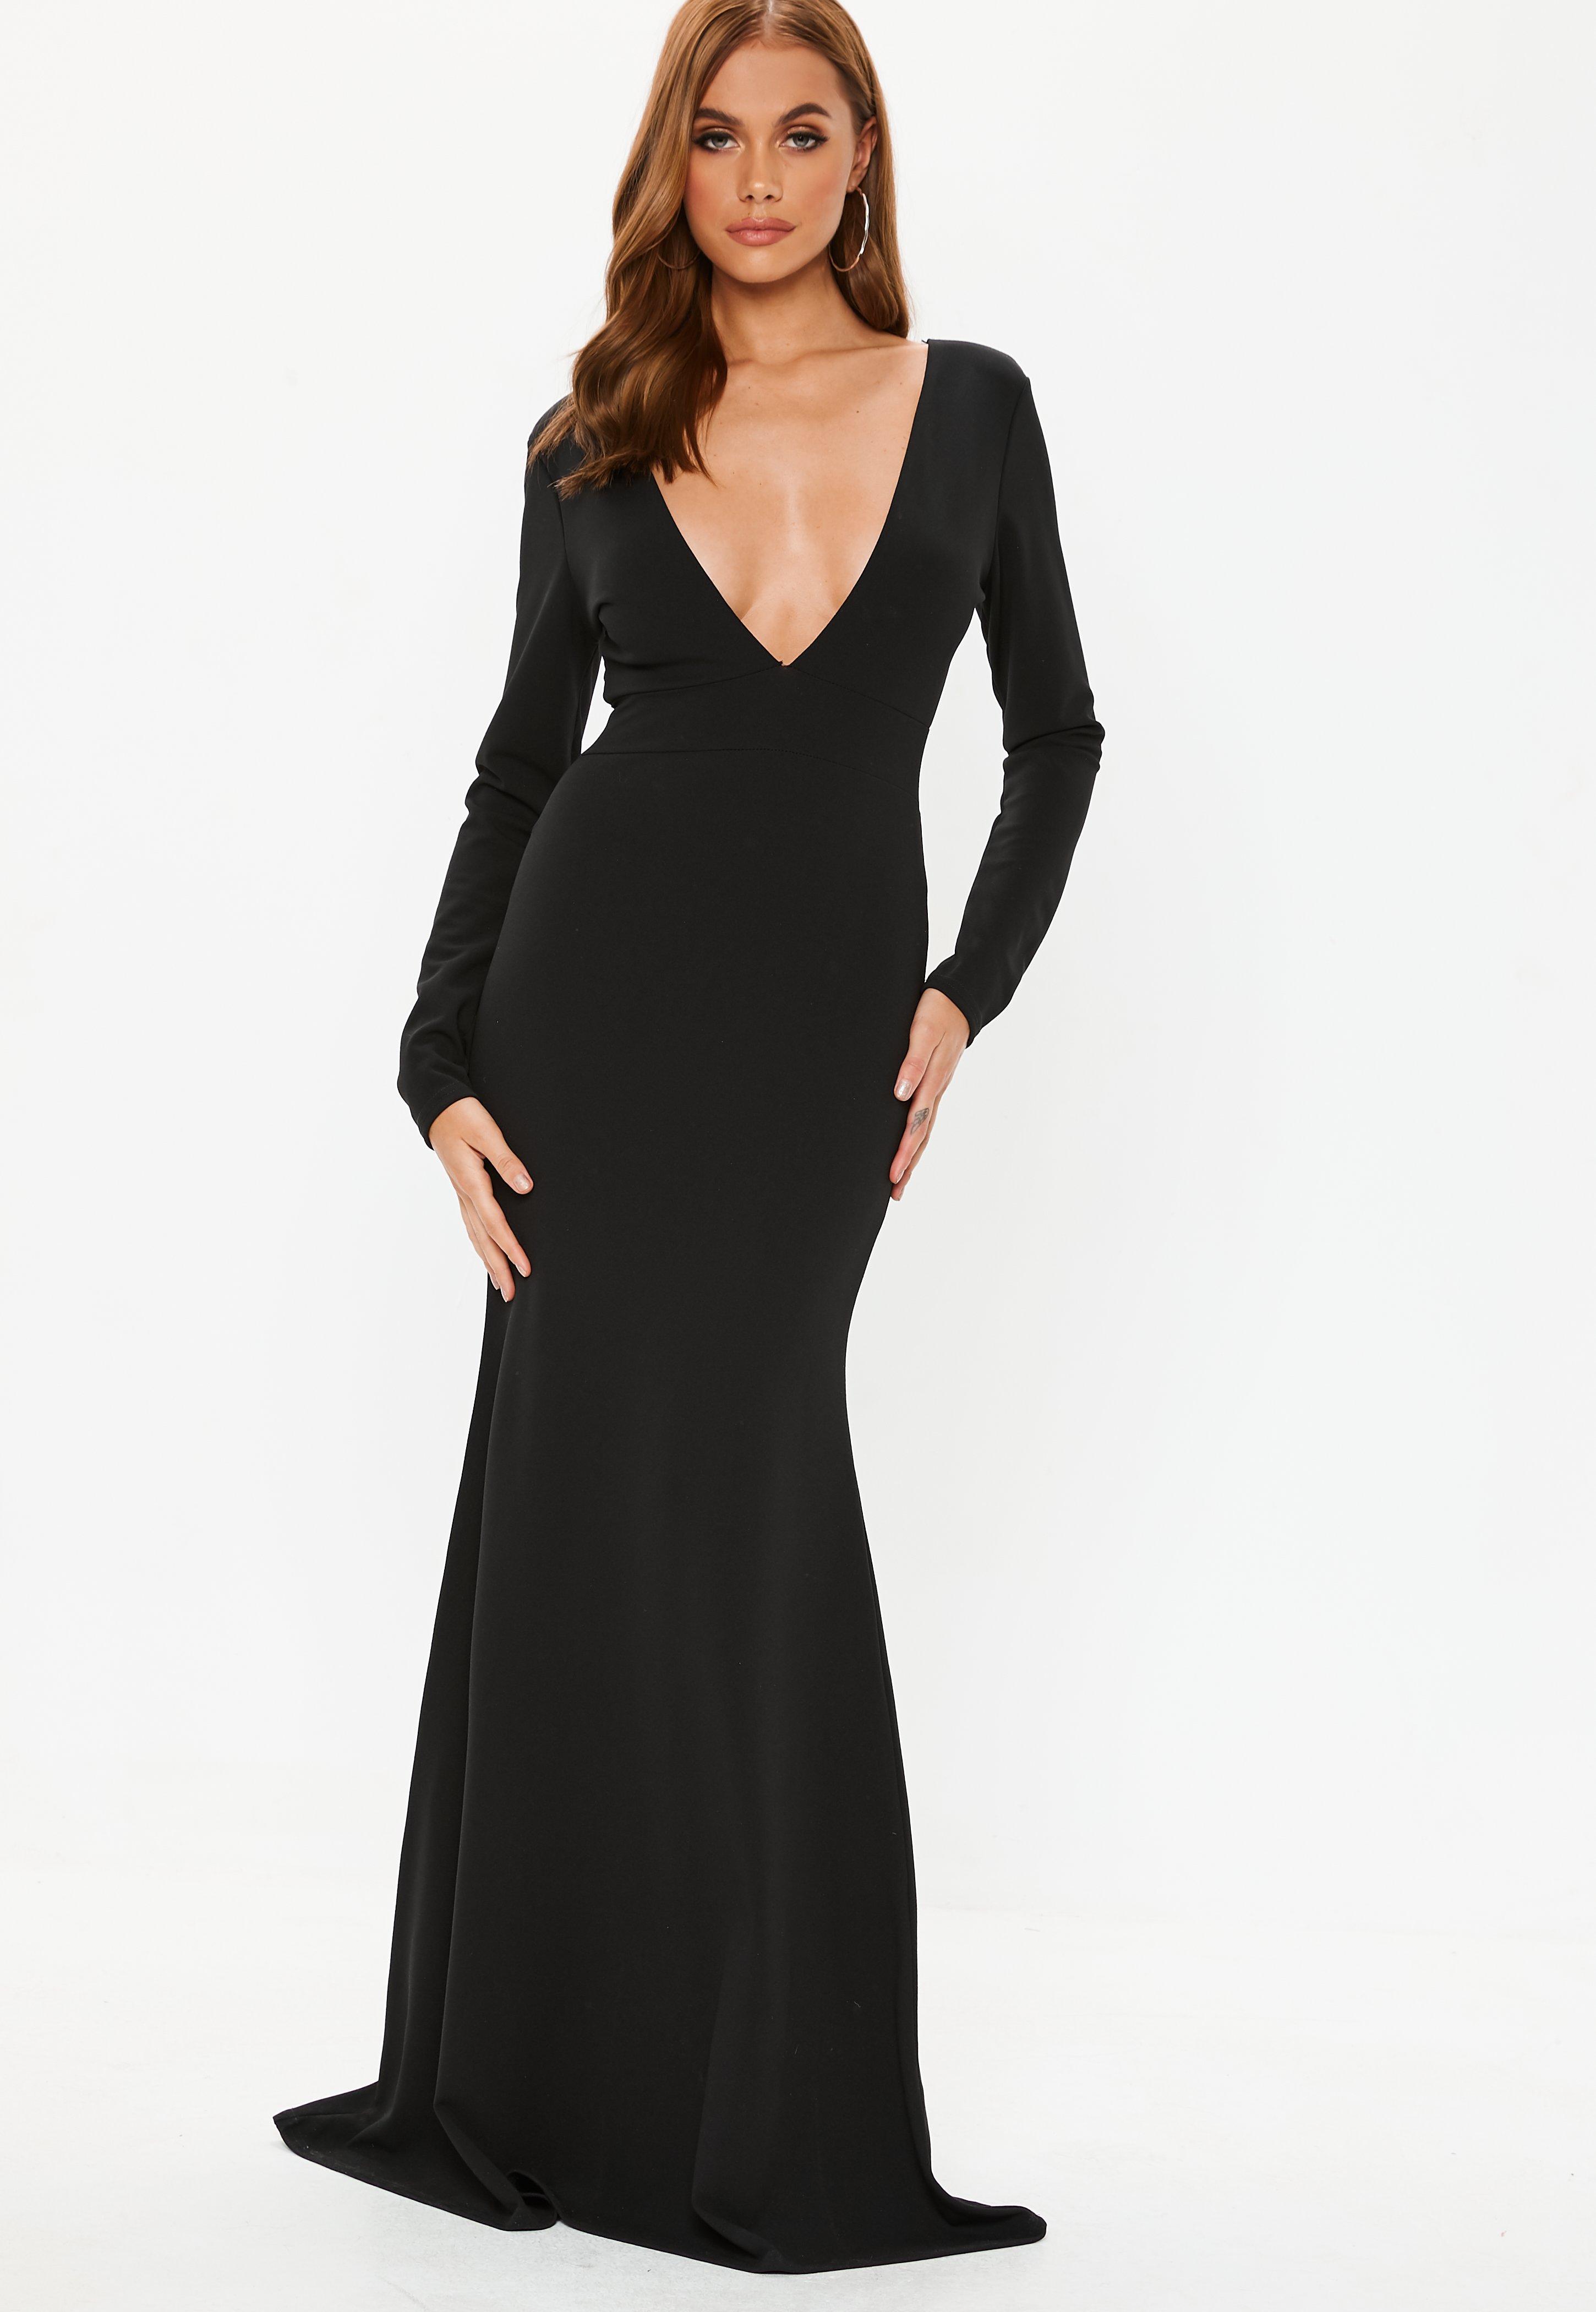 Maxi dresses - Casual & Evening Maxi Dresses UK - Missguided